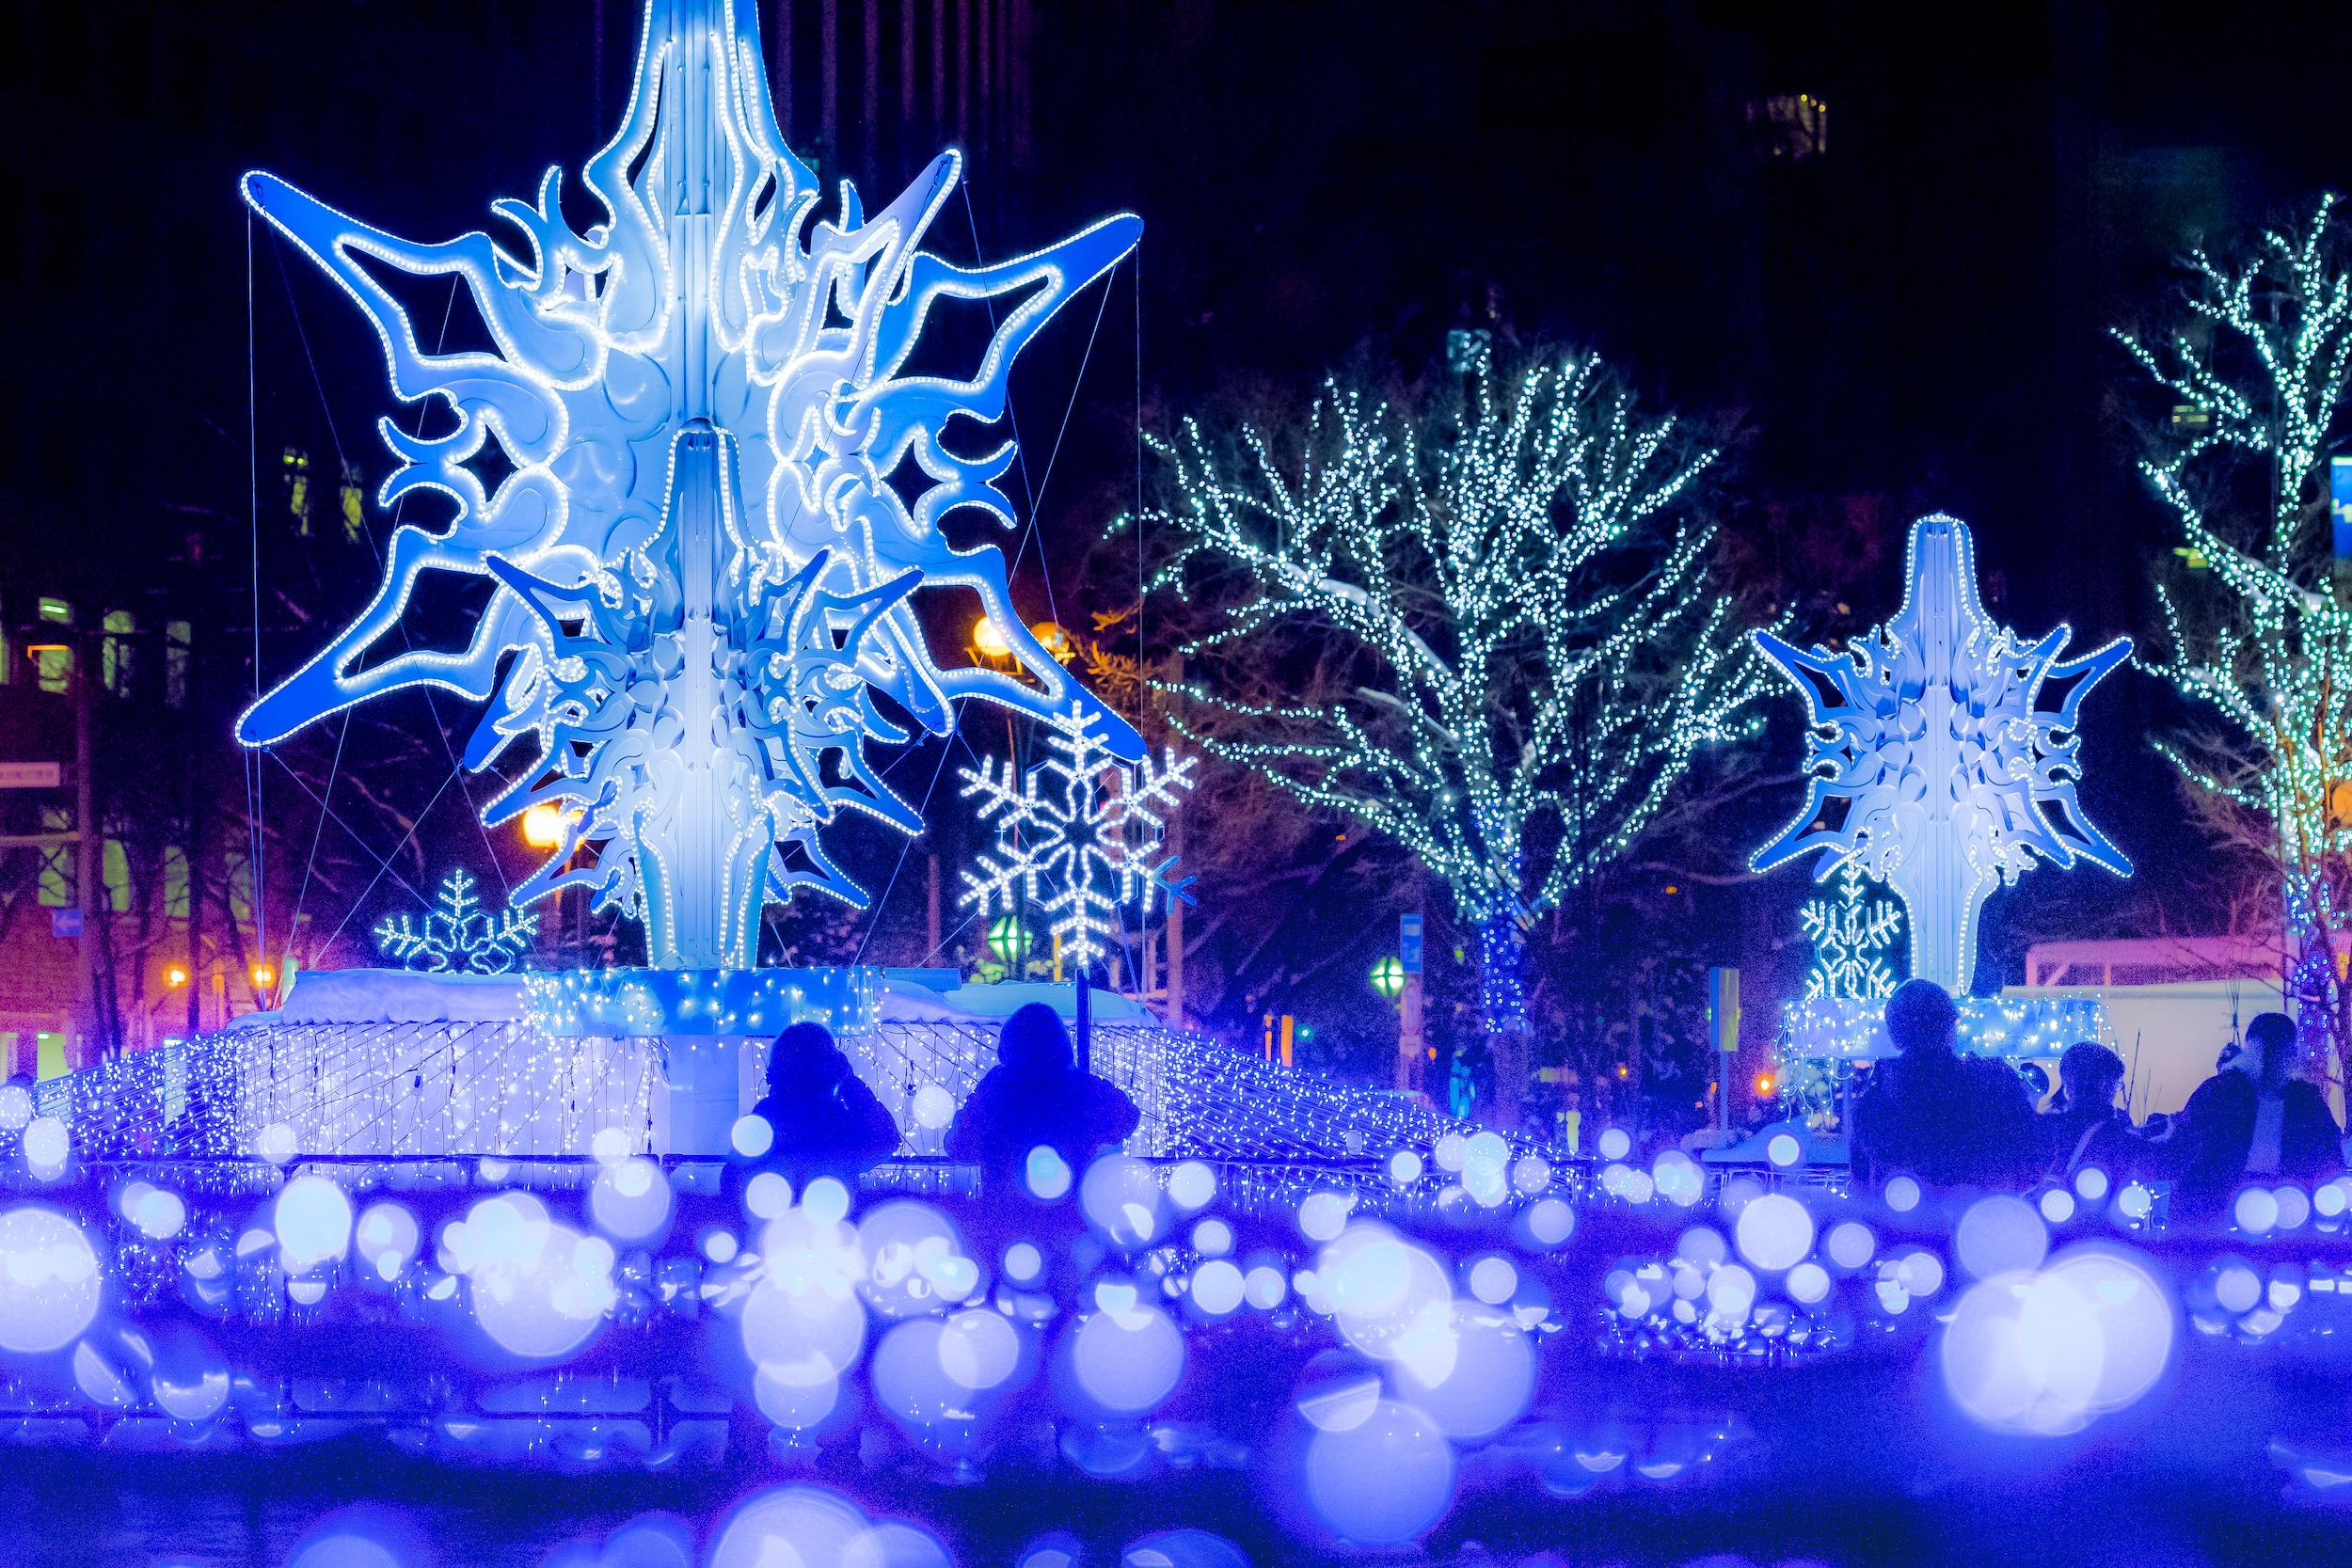 Festival neige Sapporo Japon 1